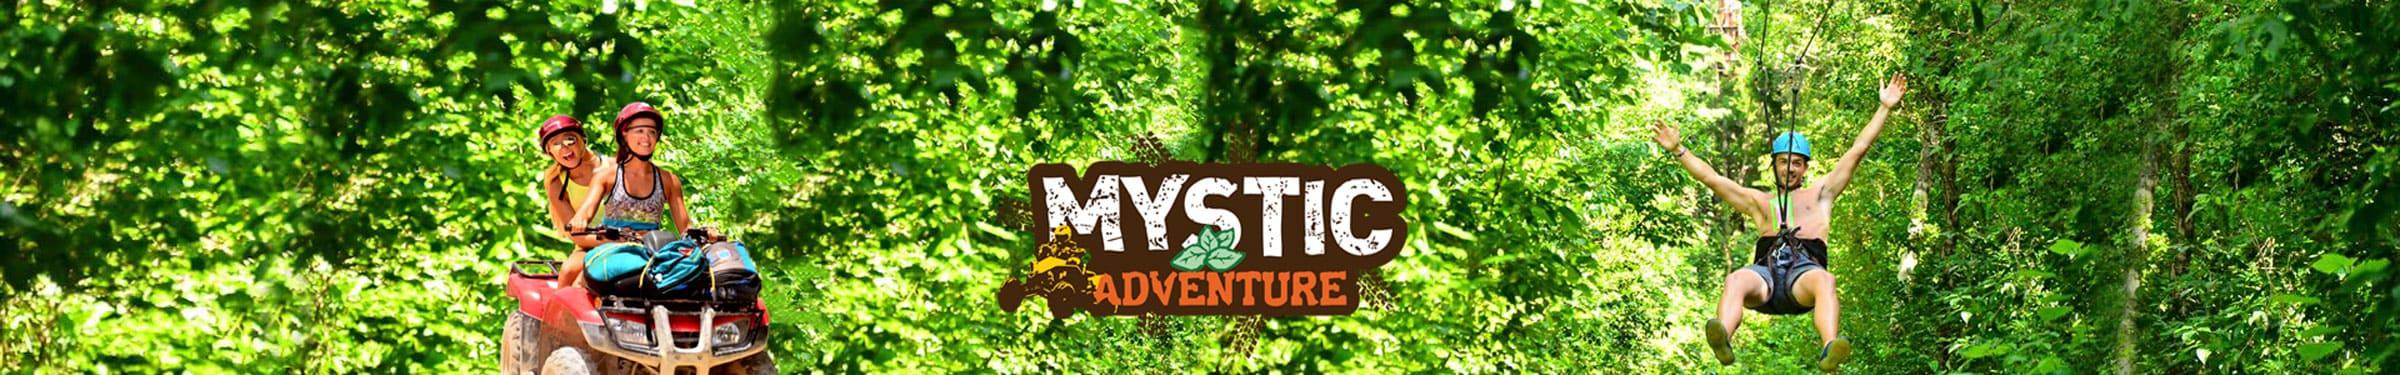 mystic-adventure-title